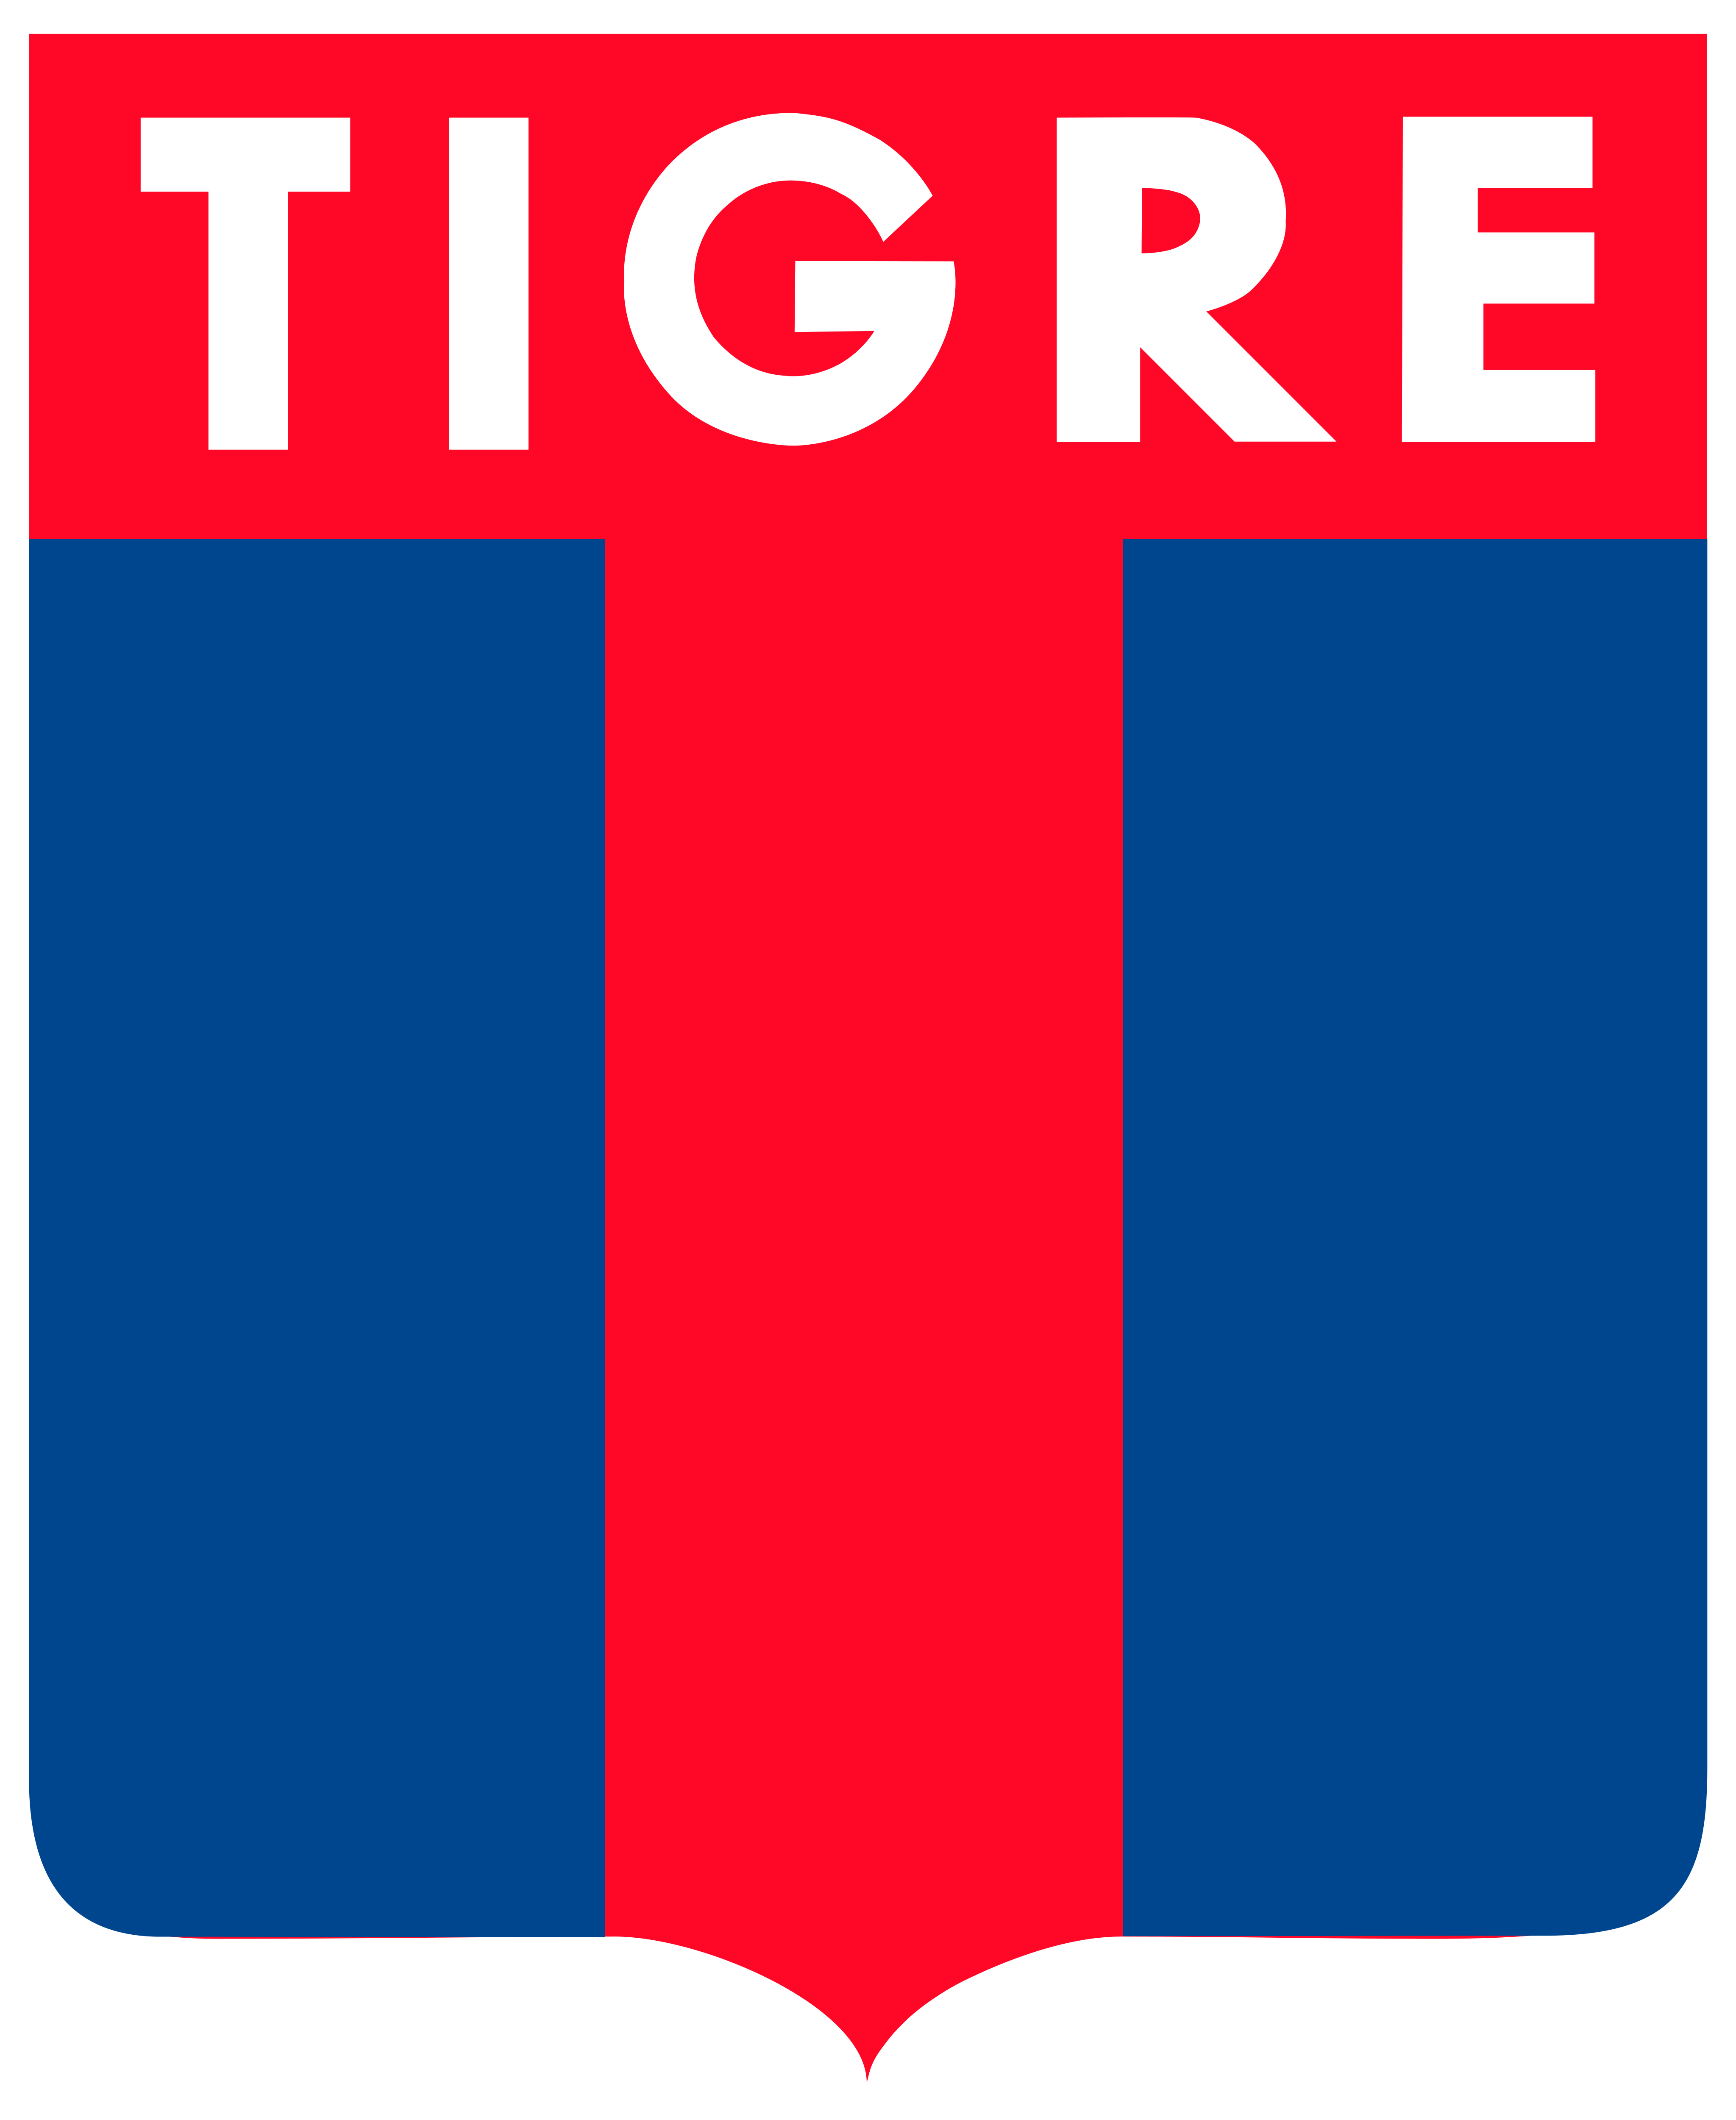 tigre-logo-argentina